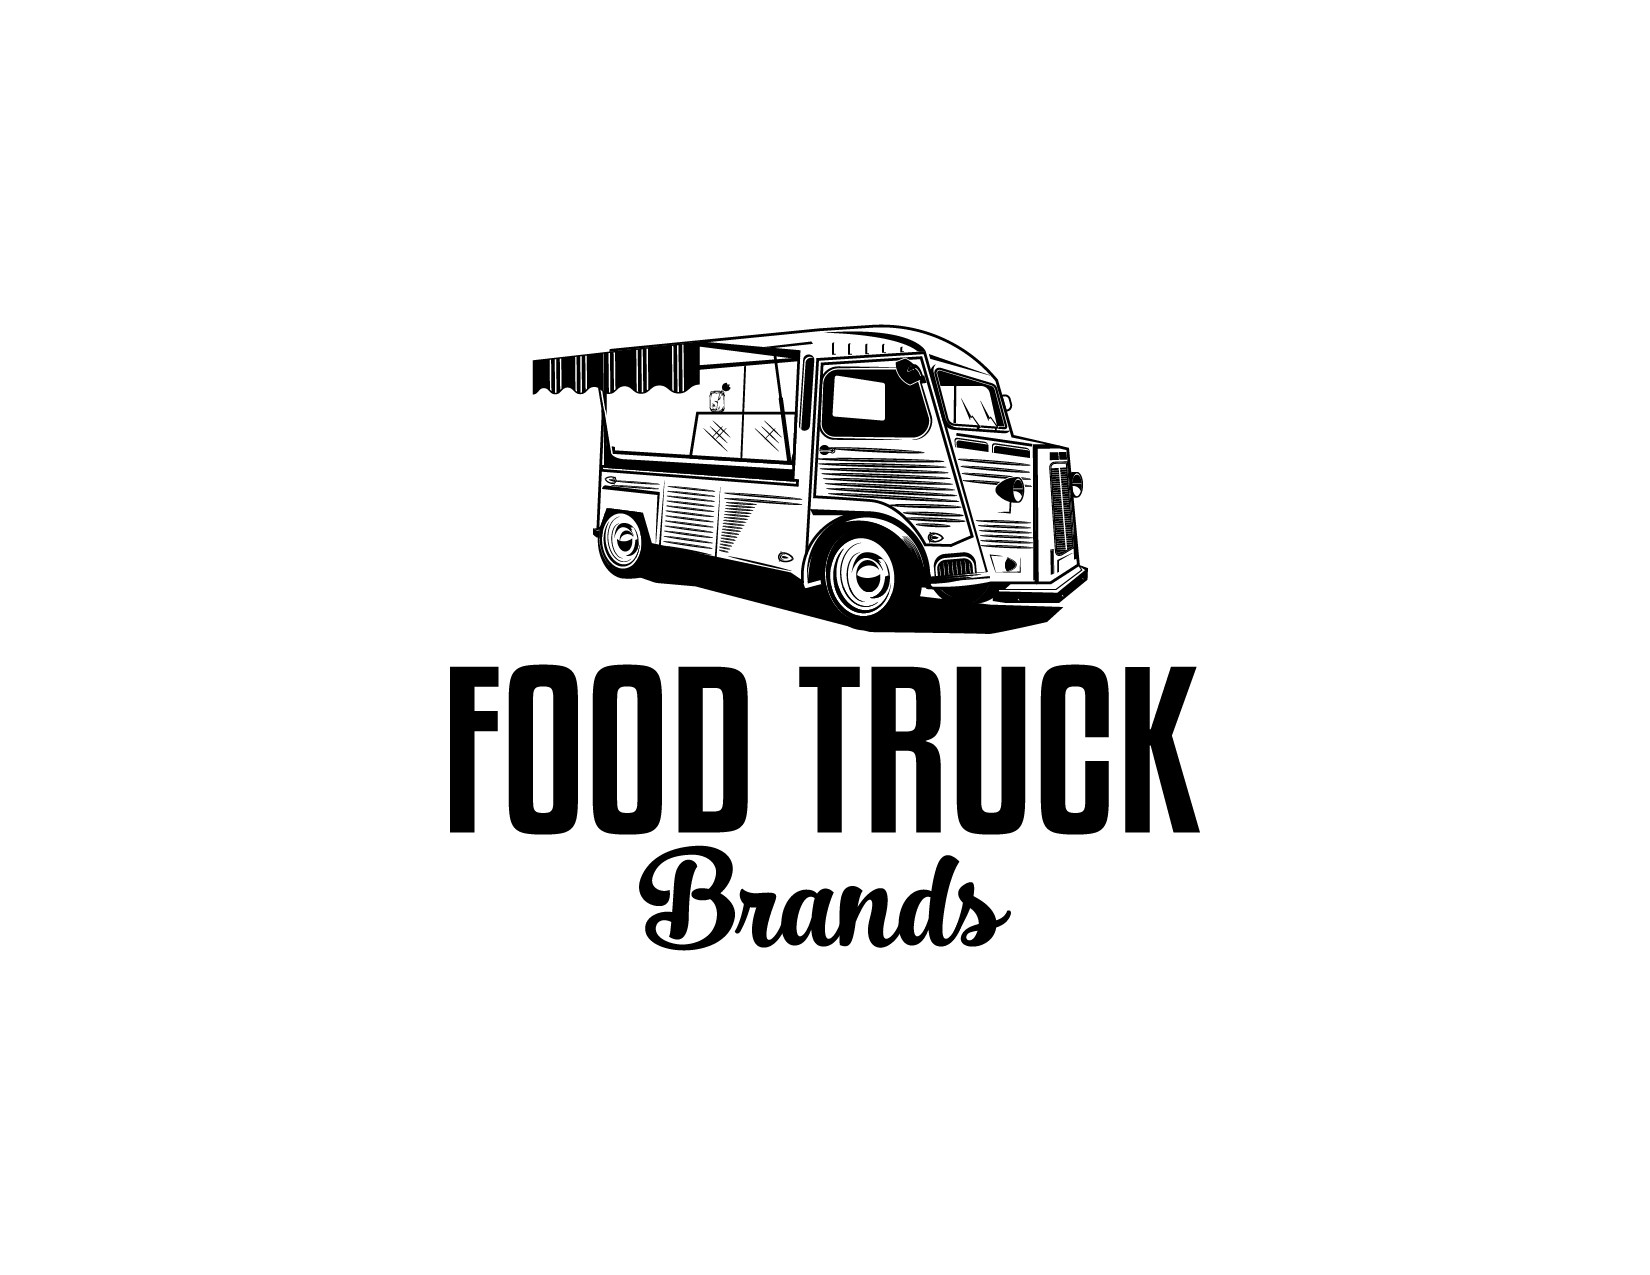 Food Truck Brands logo contest